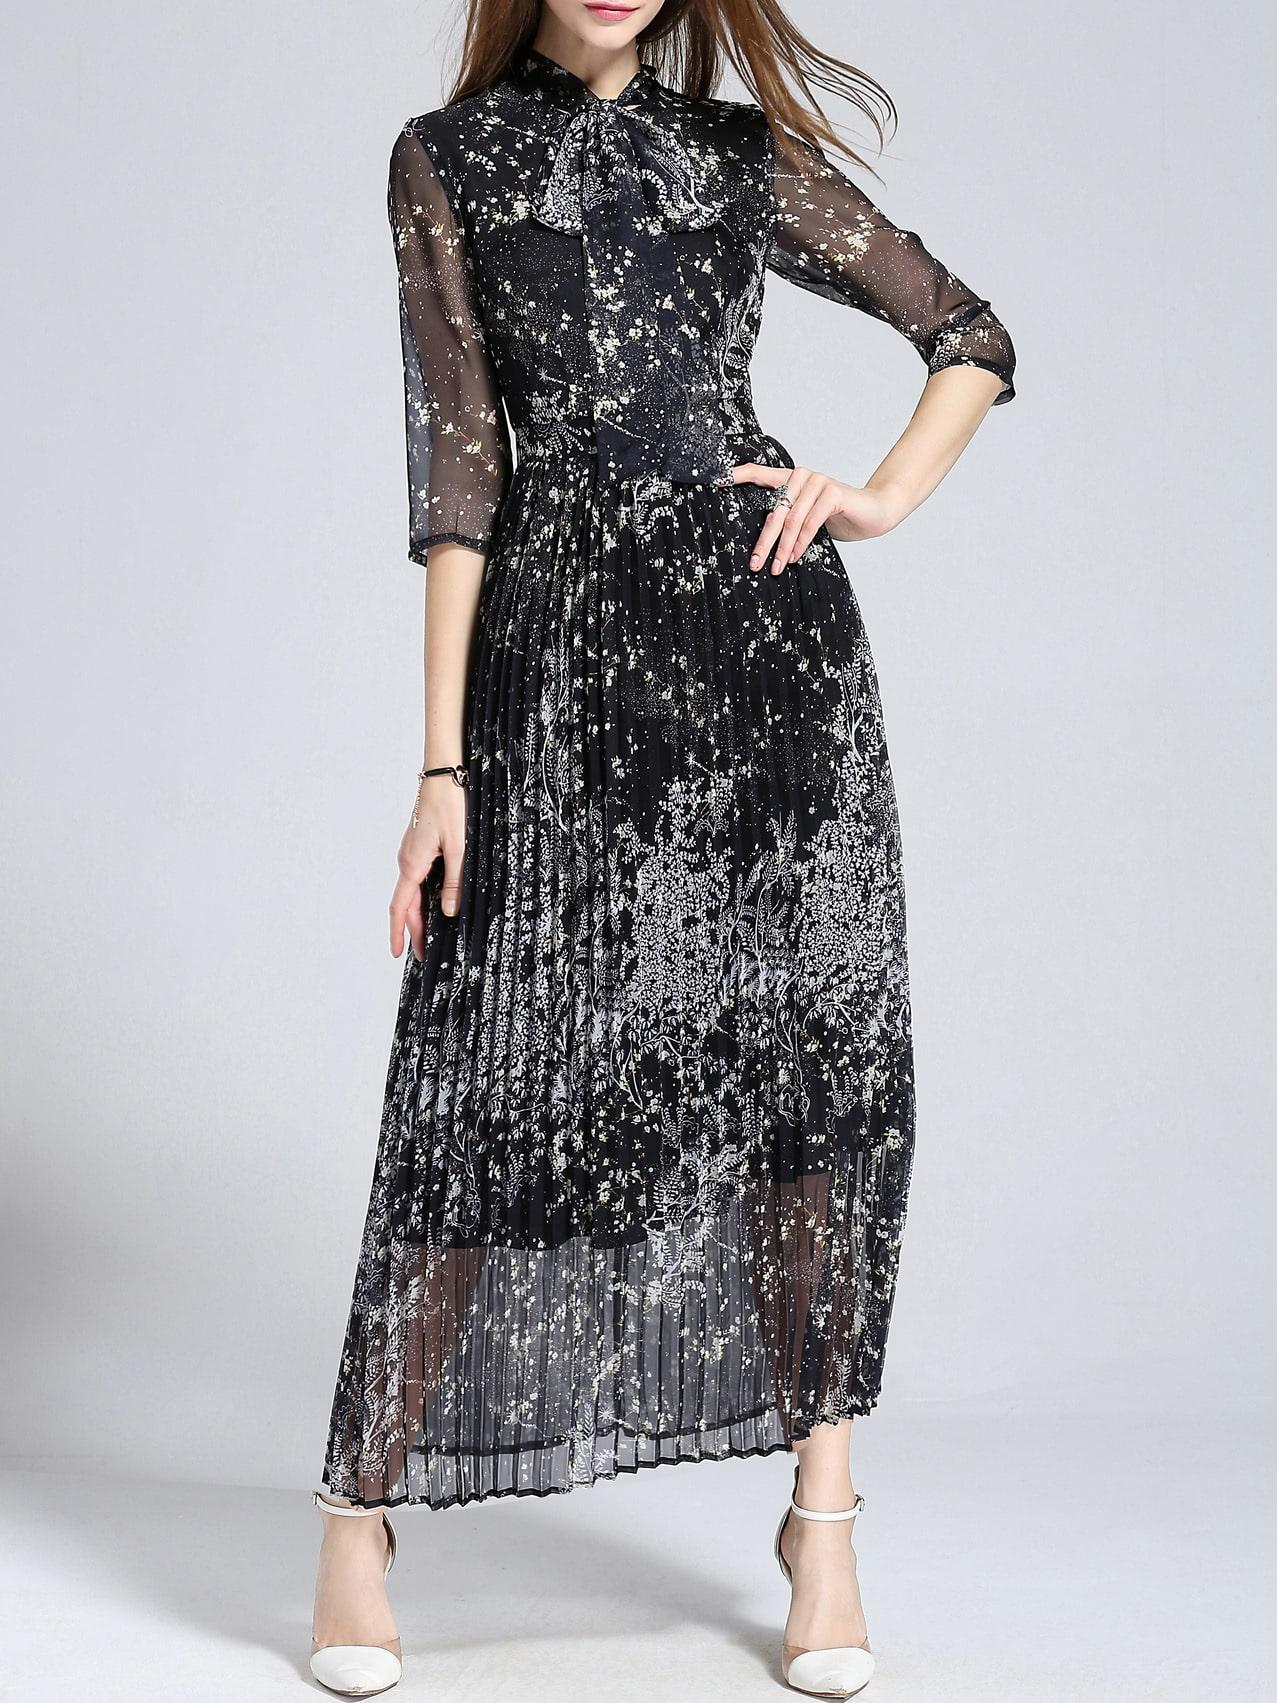 Фото Bowtie Sheer Print Pleated Dress. Купить с доставкой